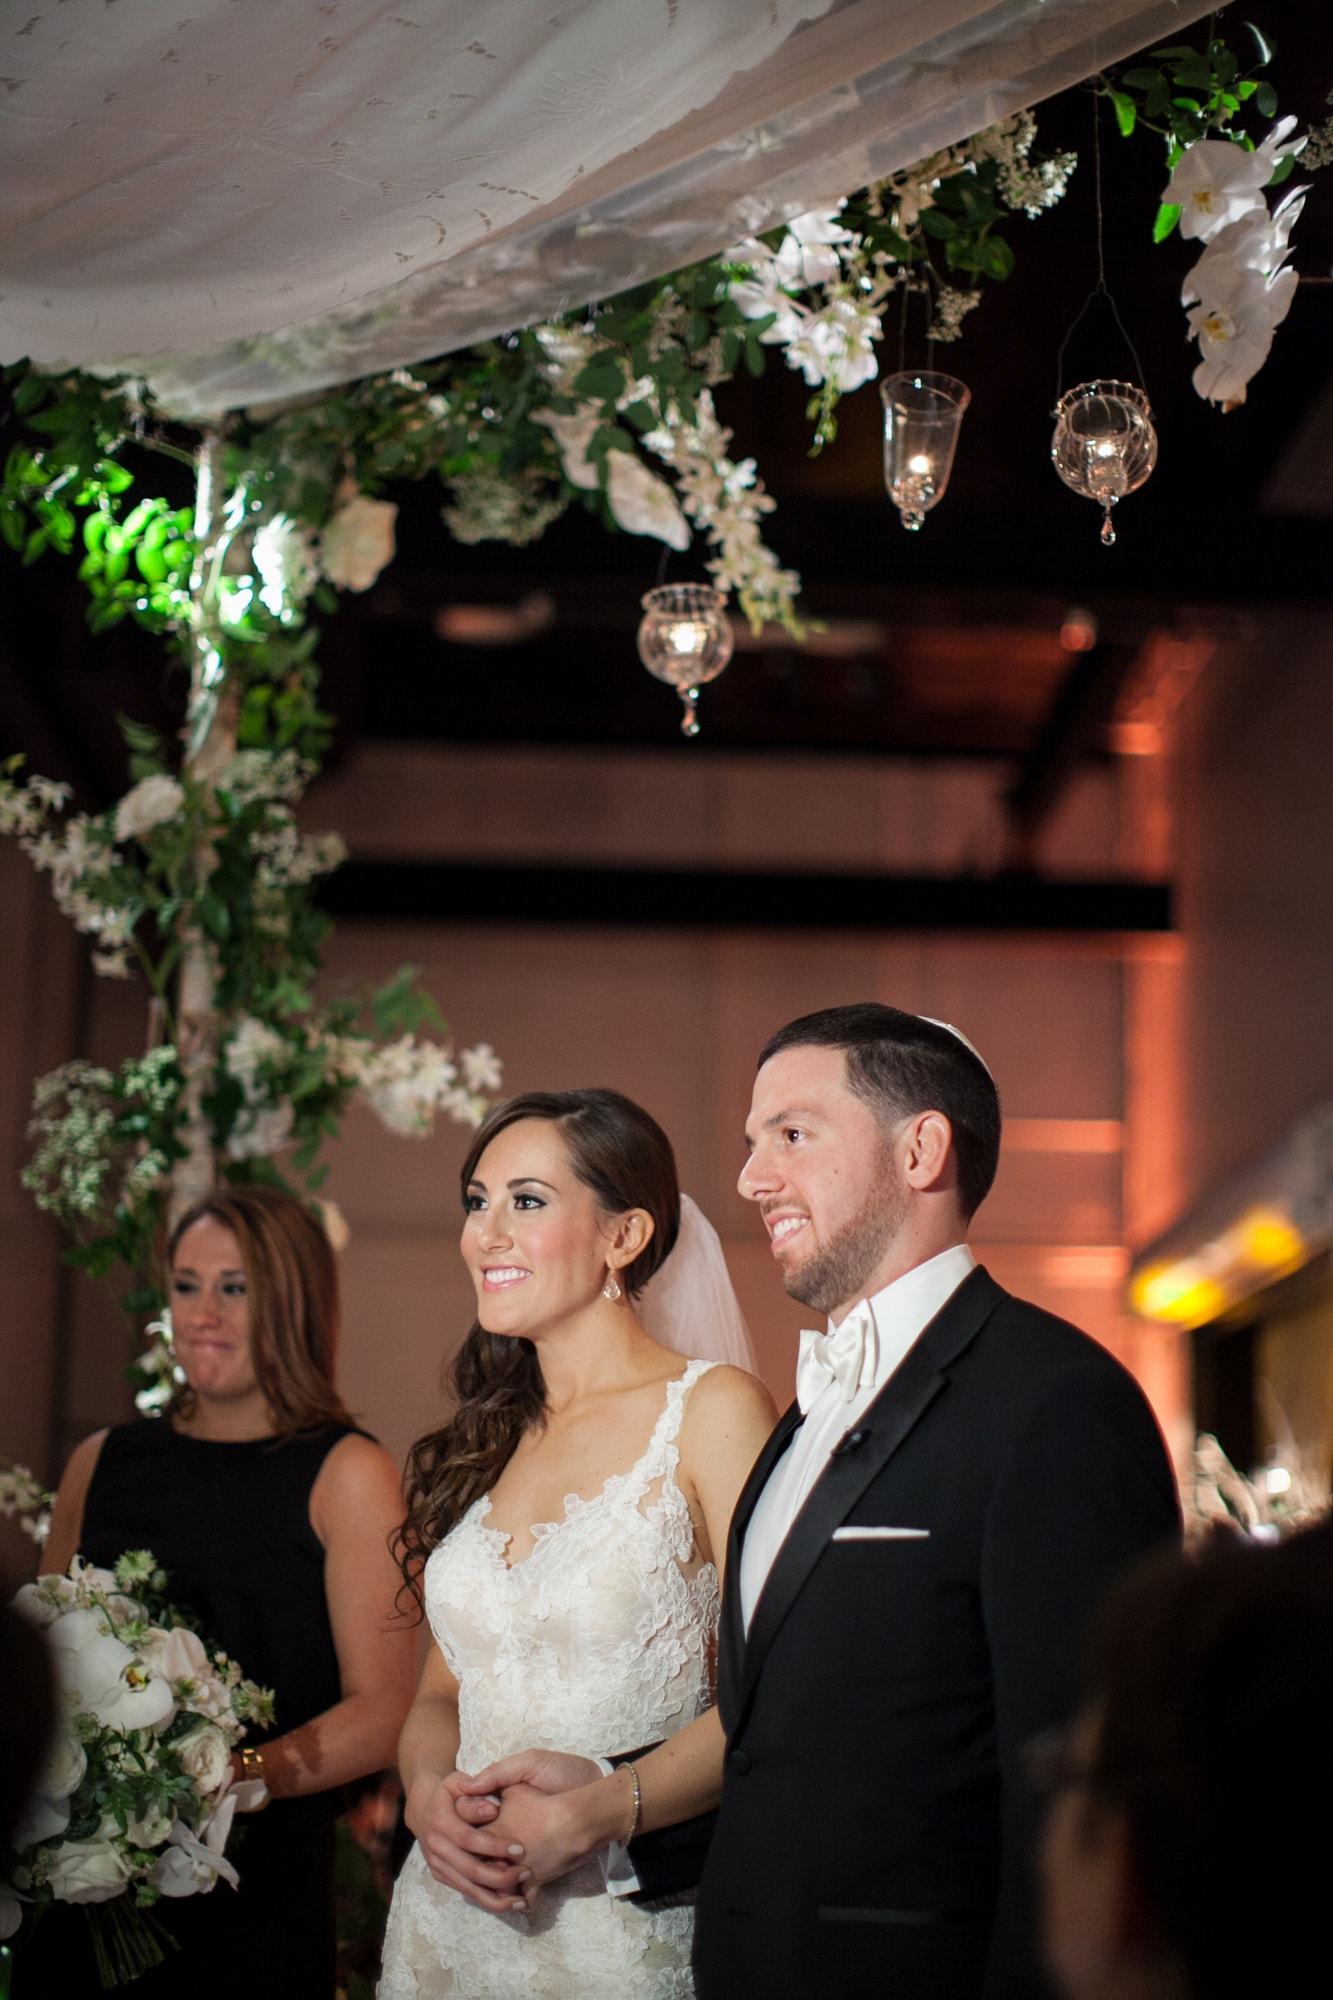 Floral huppa at Jewish wedding ceremony